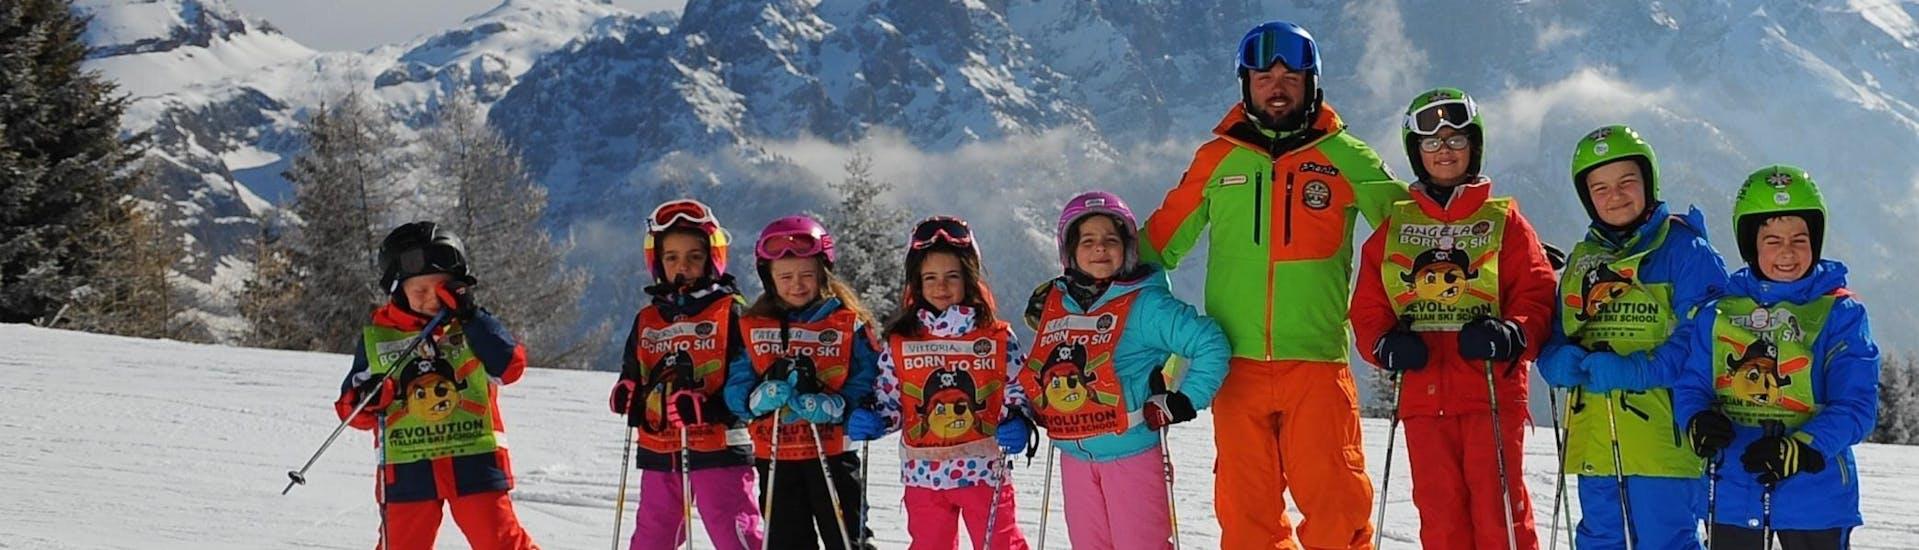 "Kids Ski Lesson ""Half Day"" (4-13 years) - Christmas at  Scuola di Sci AEvolution Folgarida Ski School are about to start, children and ski instructor pose for a photo."